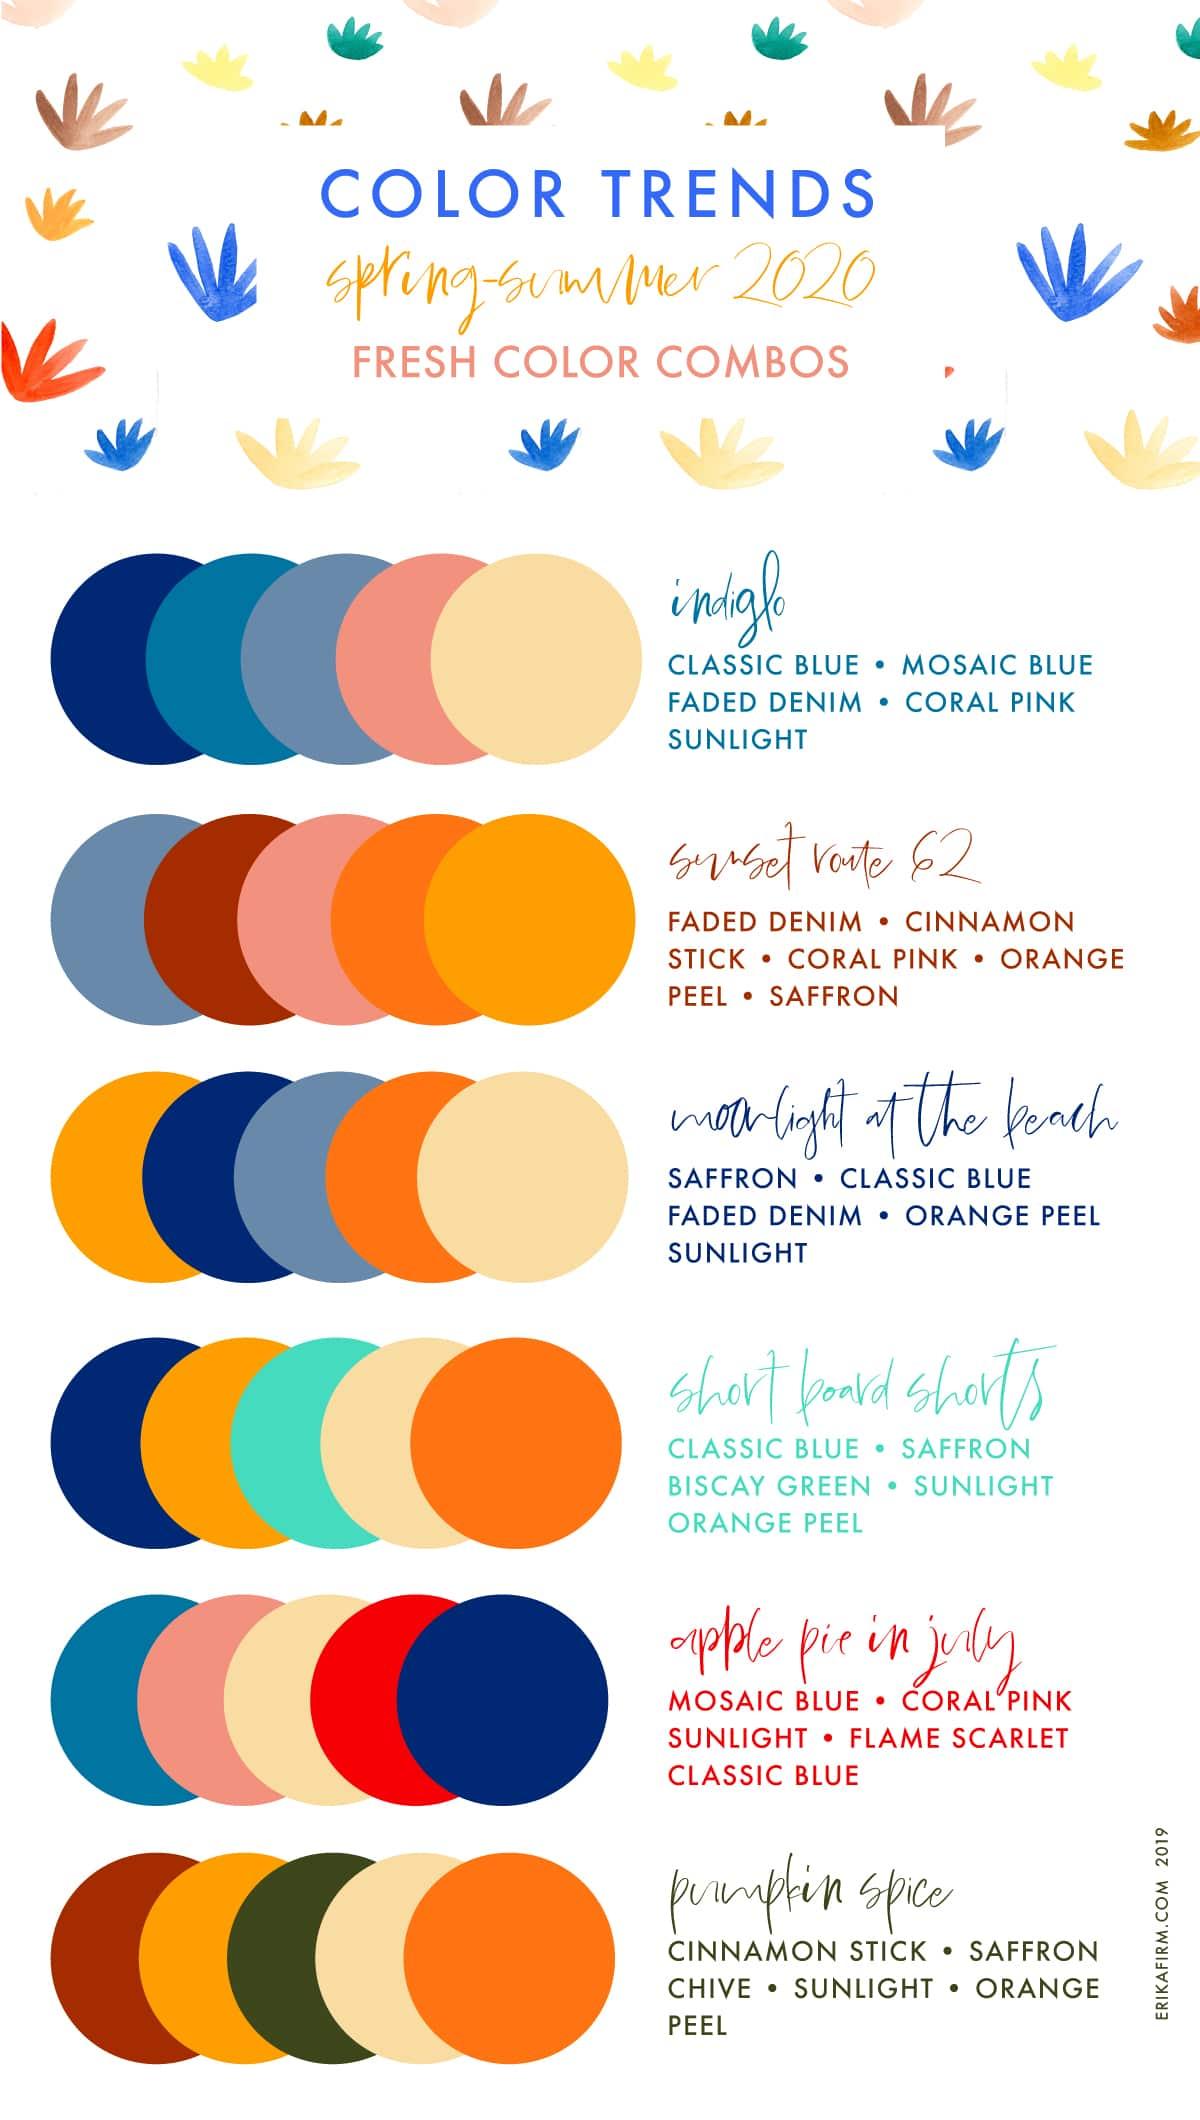 Color trends spring summer 2020